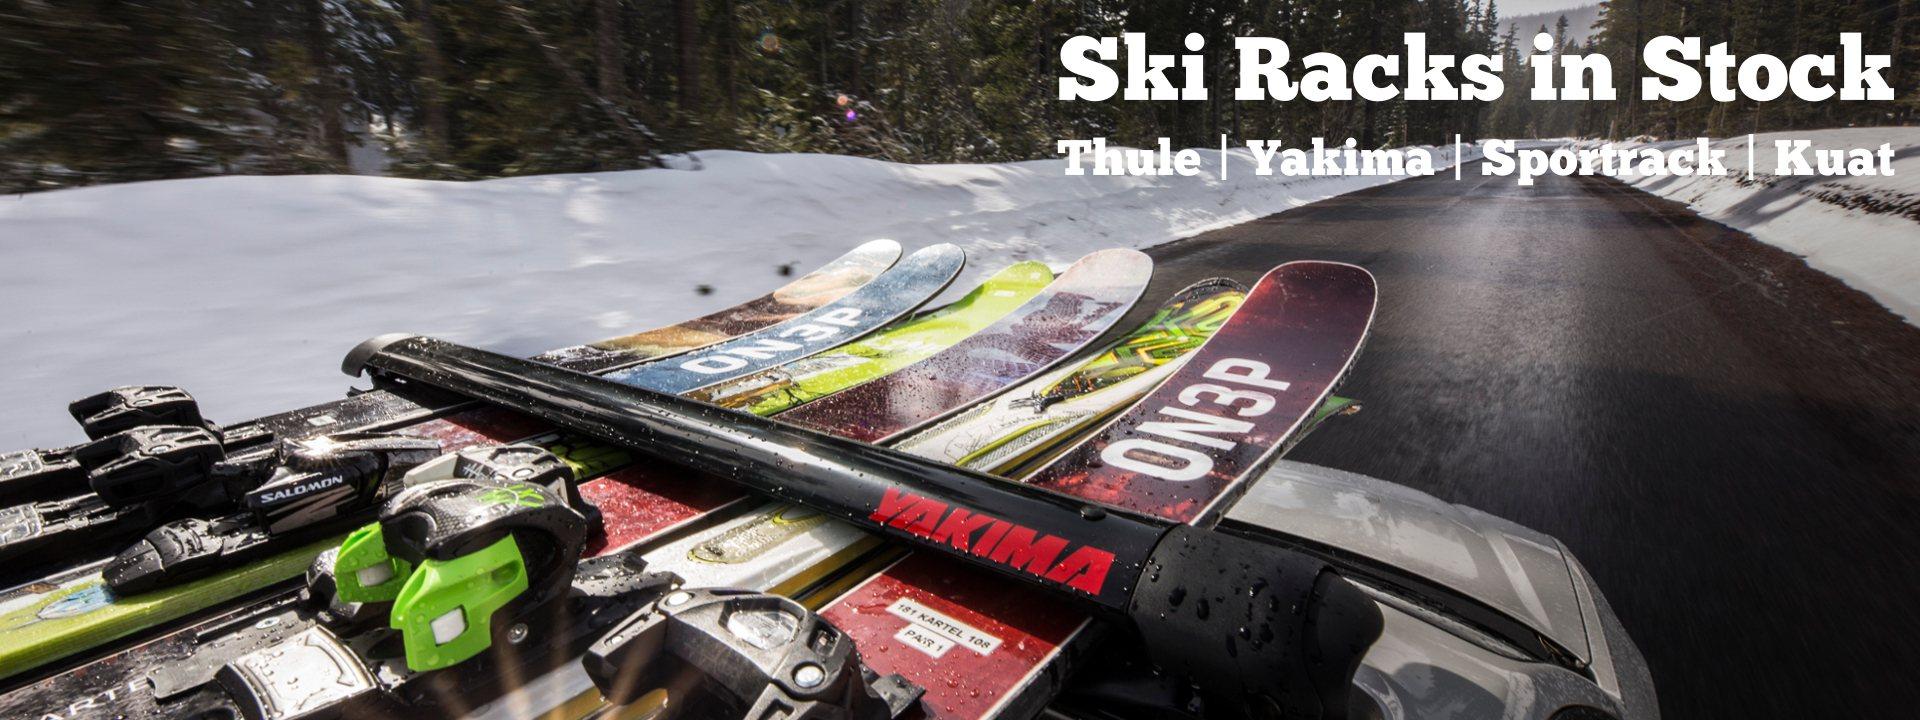 Ski season is just around the corner!